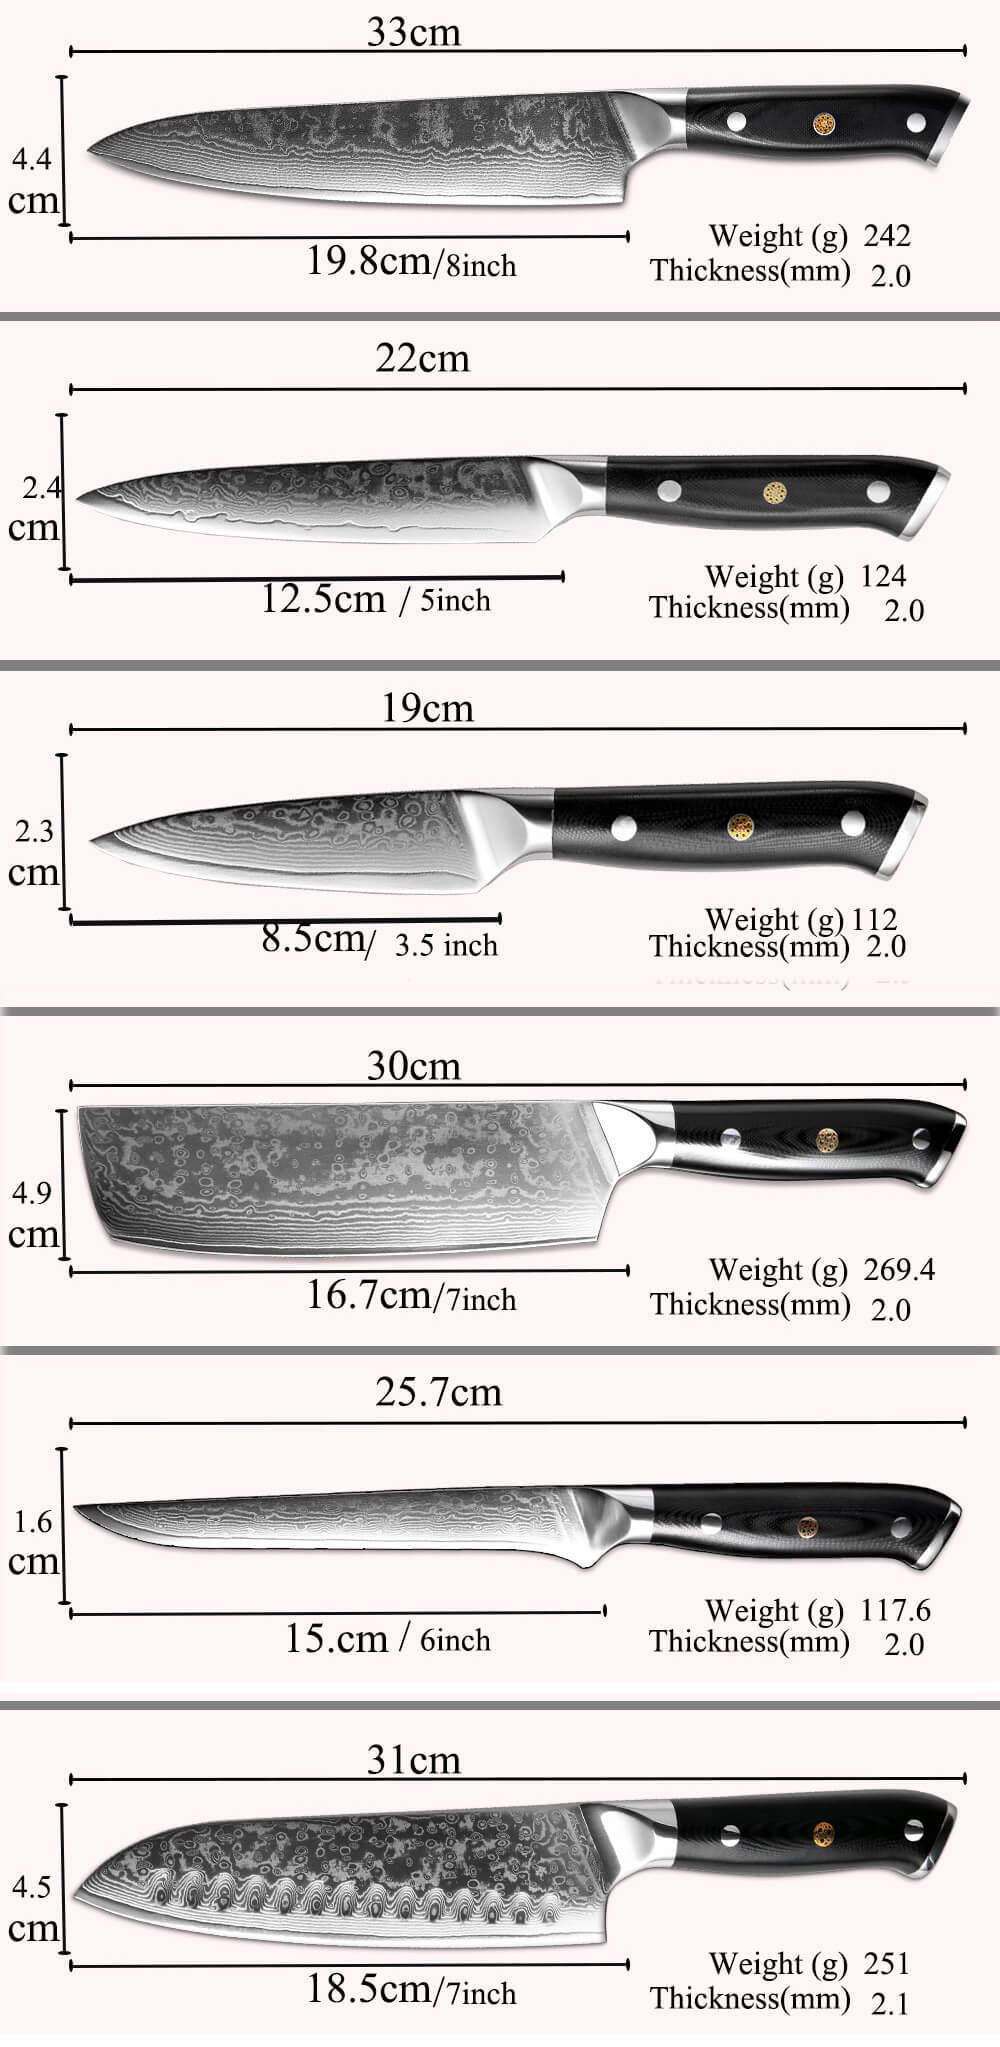 Damascus Kitchen Knife Set - Size